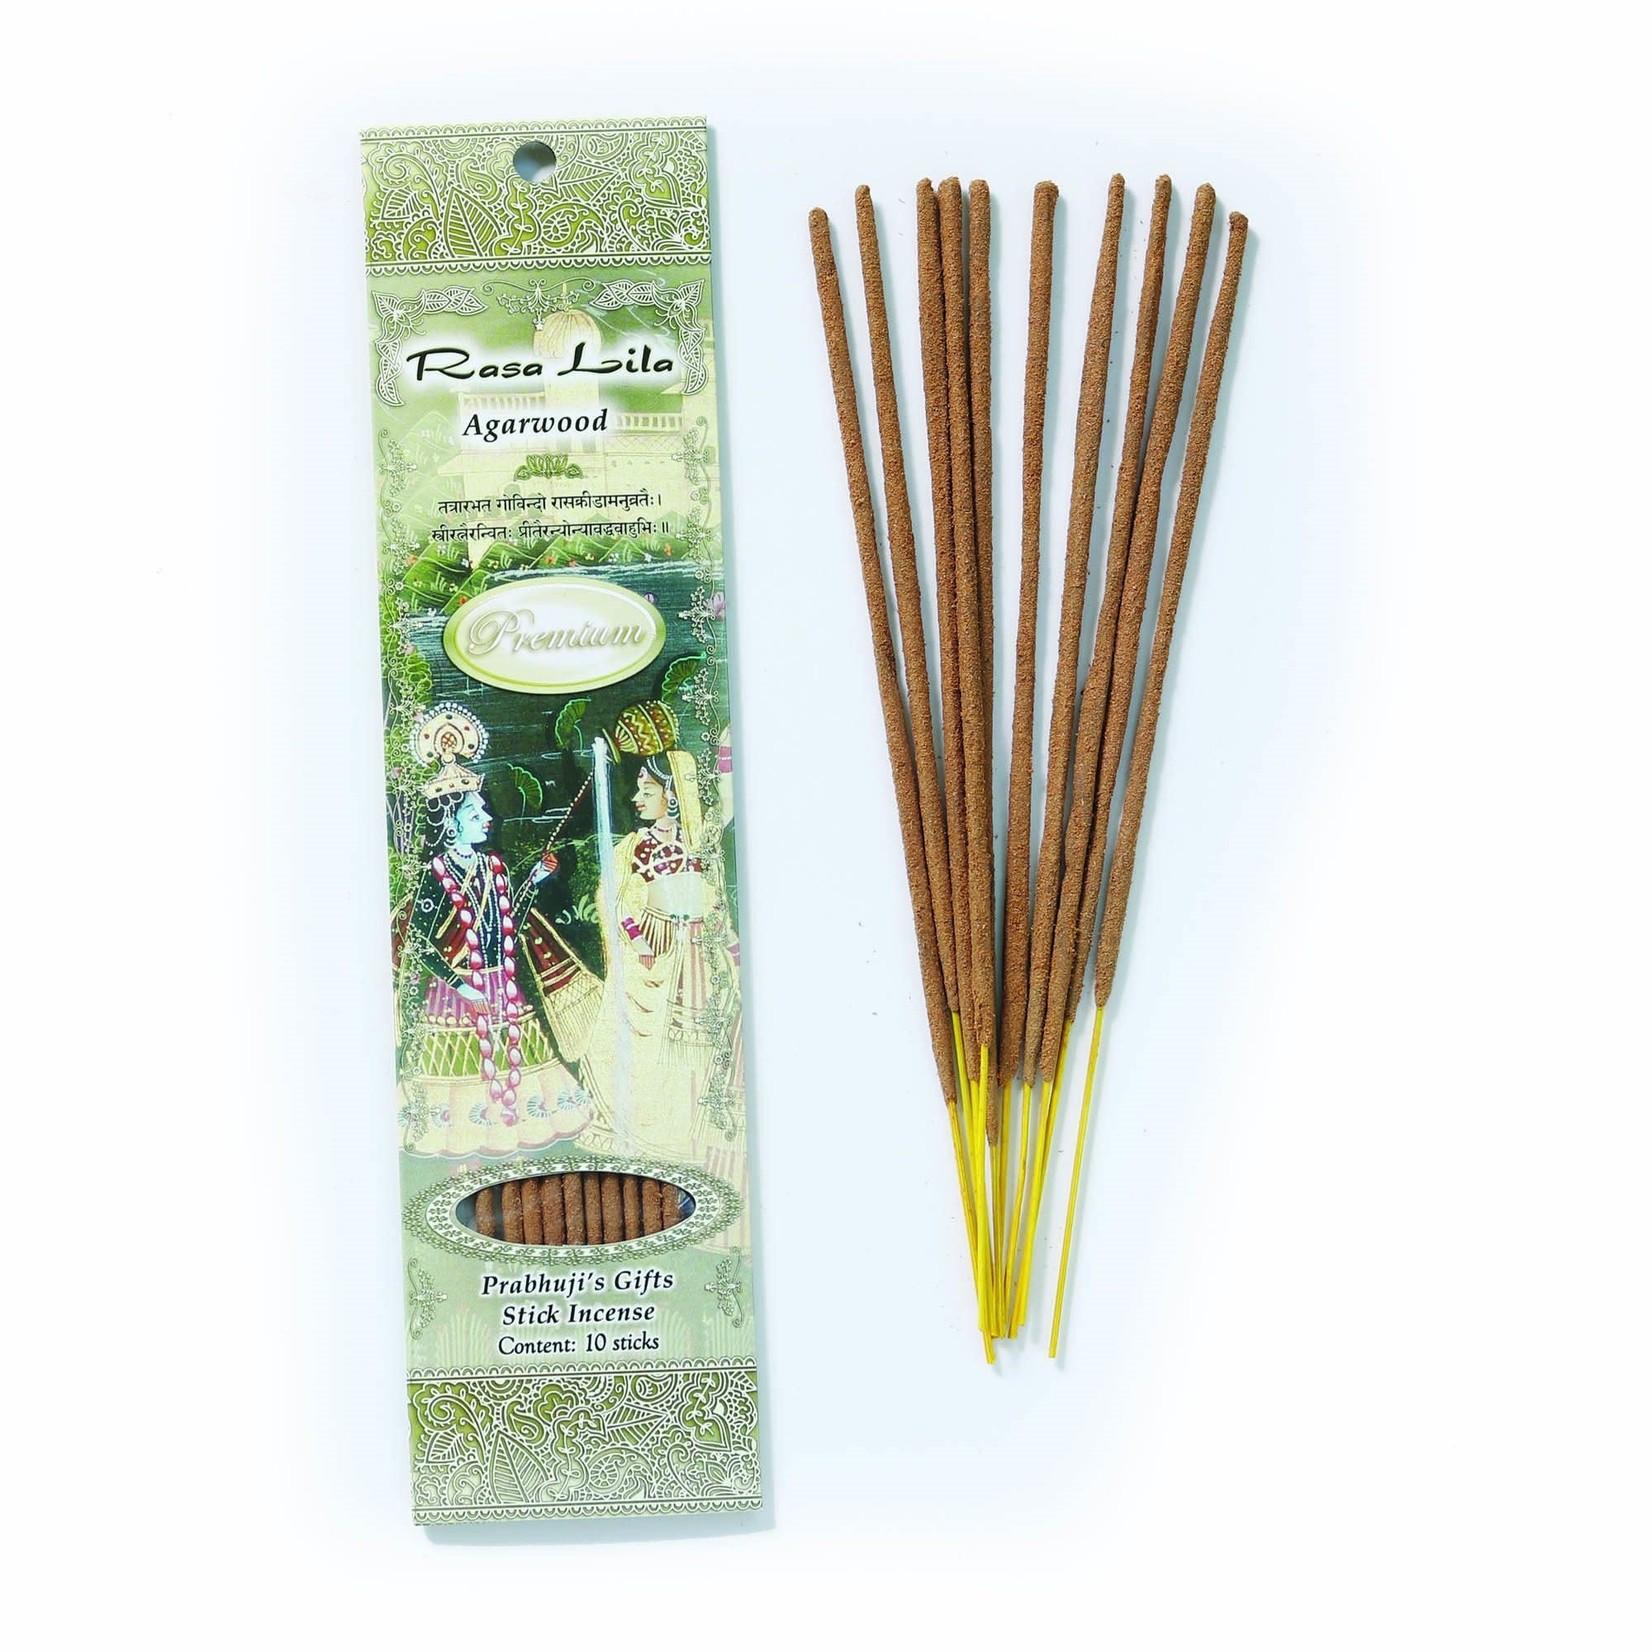 Prabhujis Gifts Rasa Lila - Premium Incense Sticks